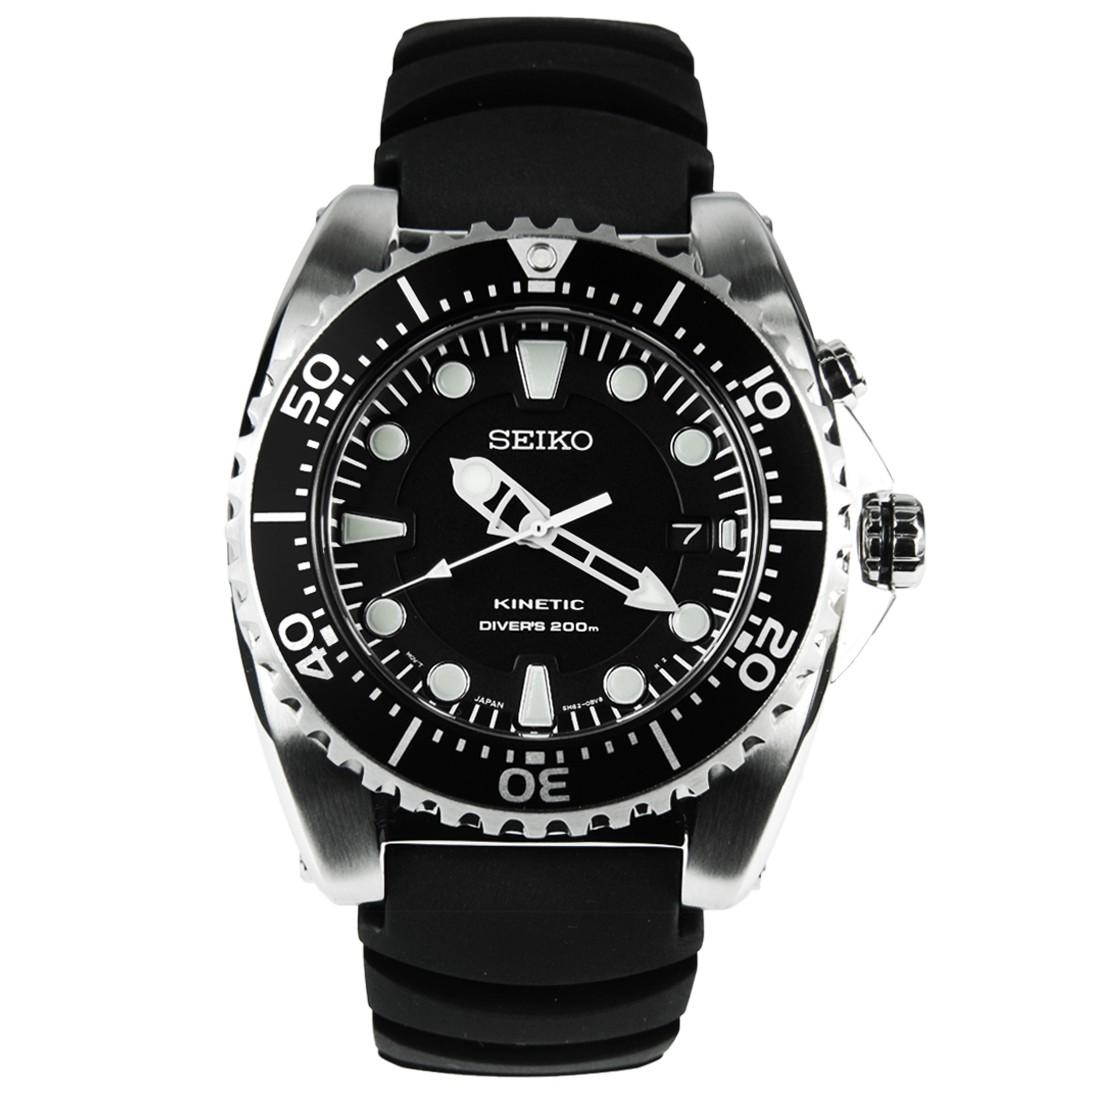 3f17130acda13 Seiko Kinetic Diver s SKA371 SKA371P SKA371P2 -